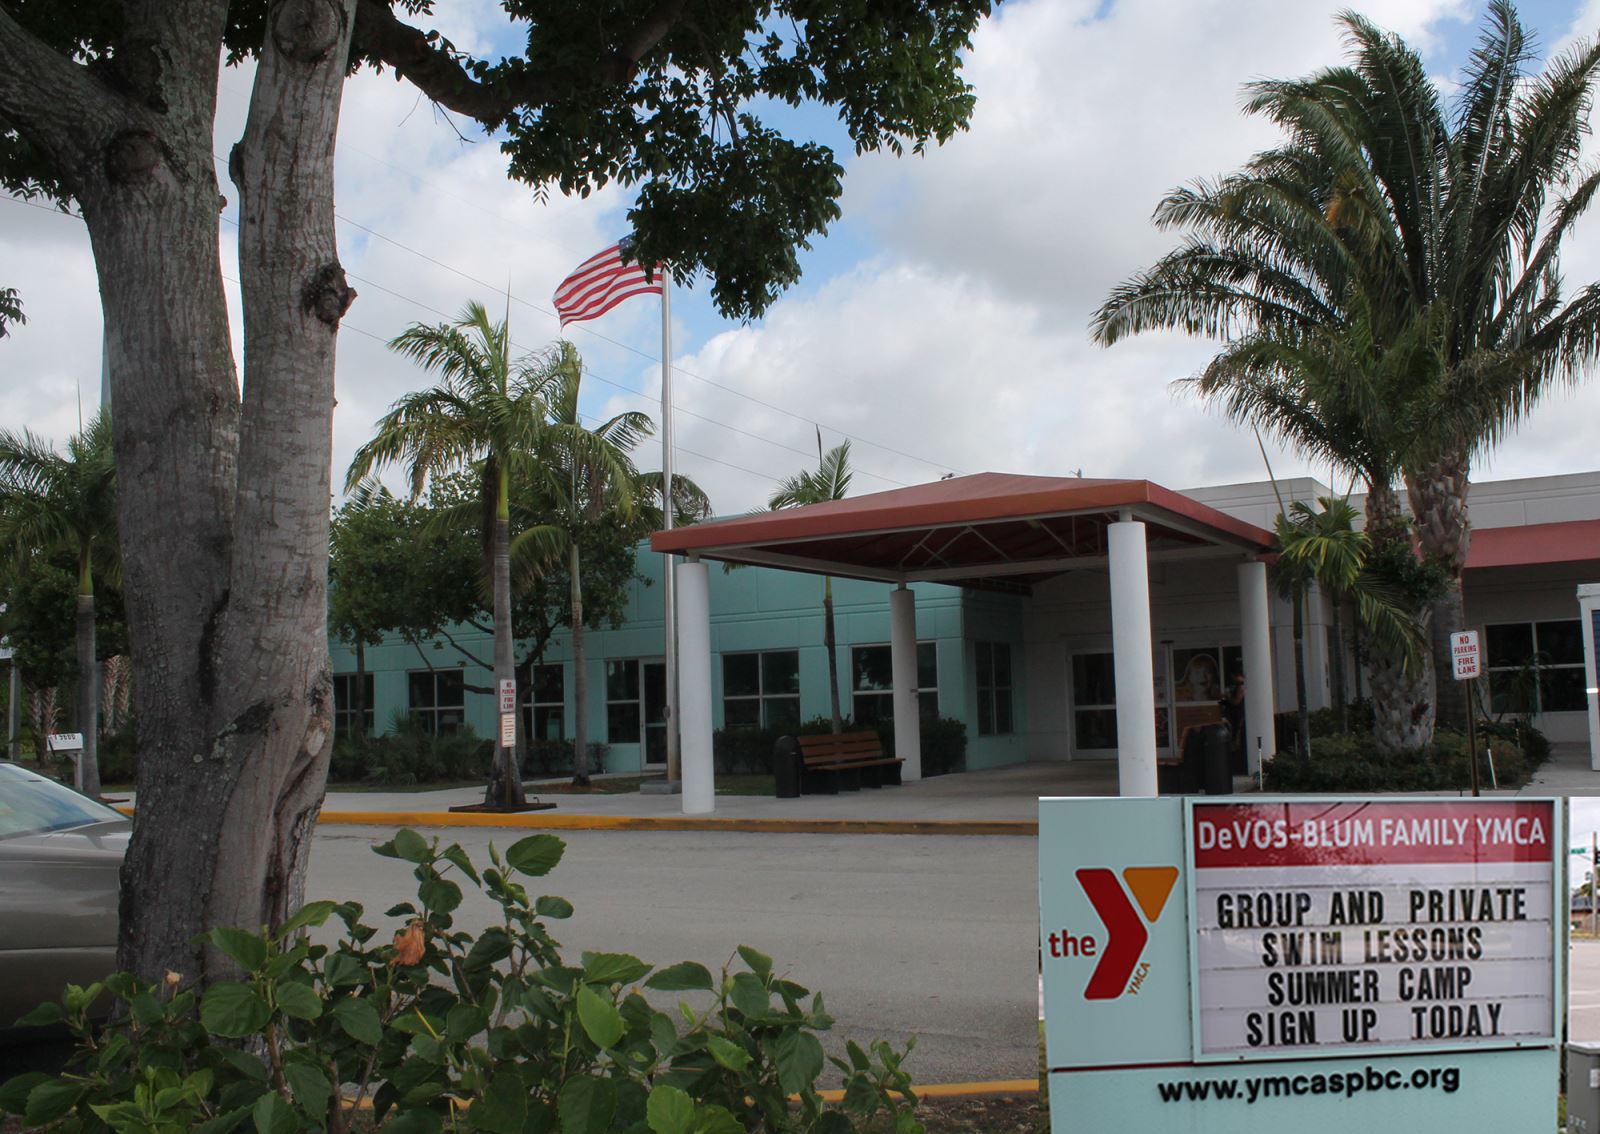 DeVos-Blum Family YMCA of Boynton Beach